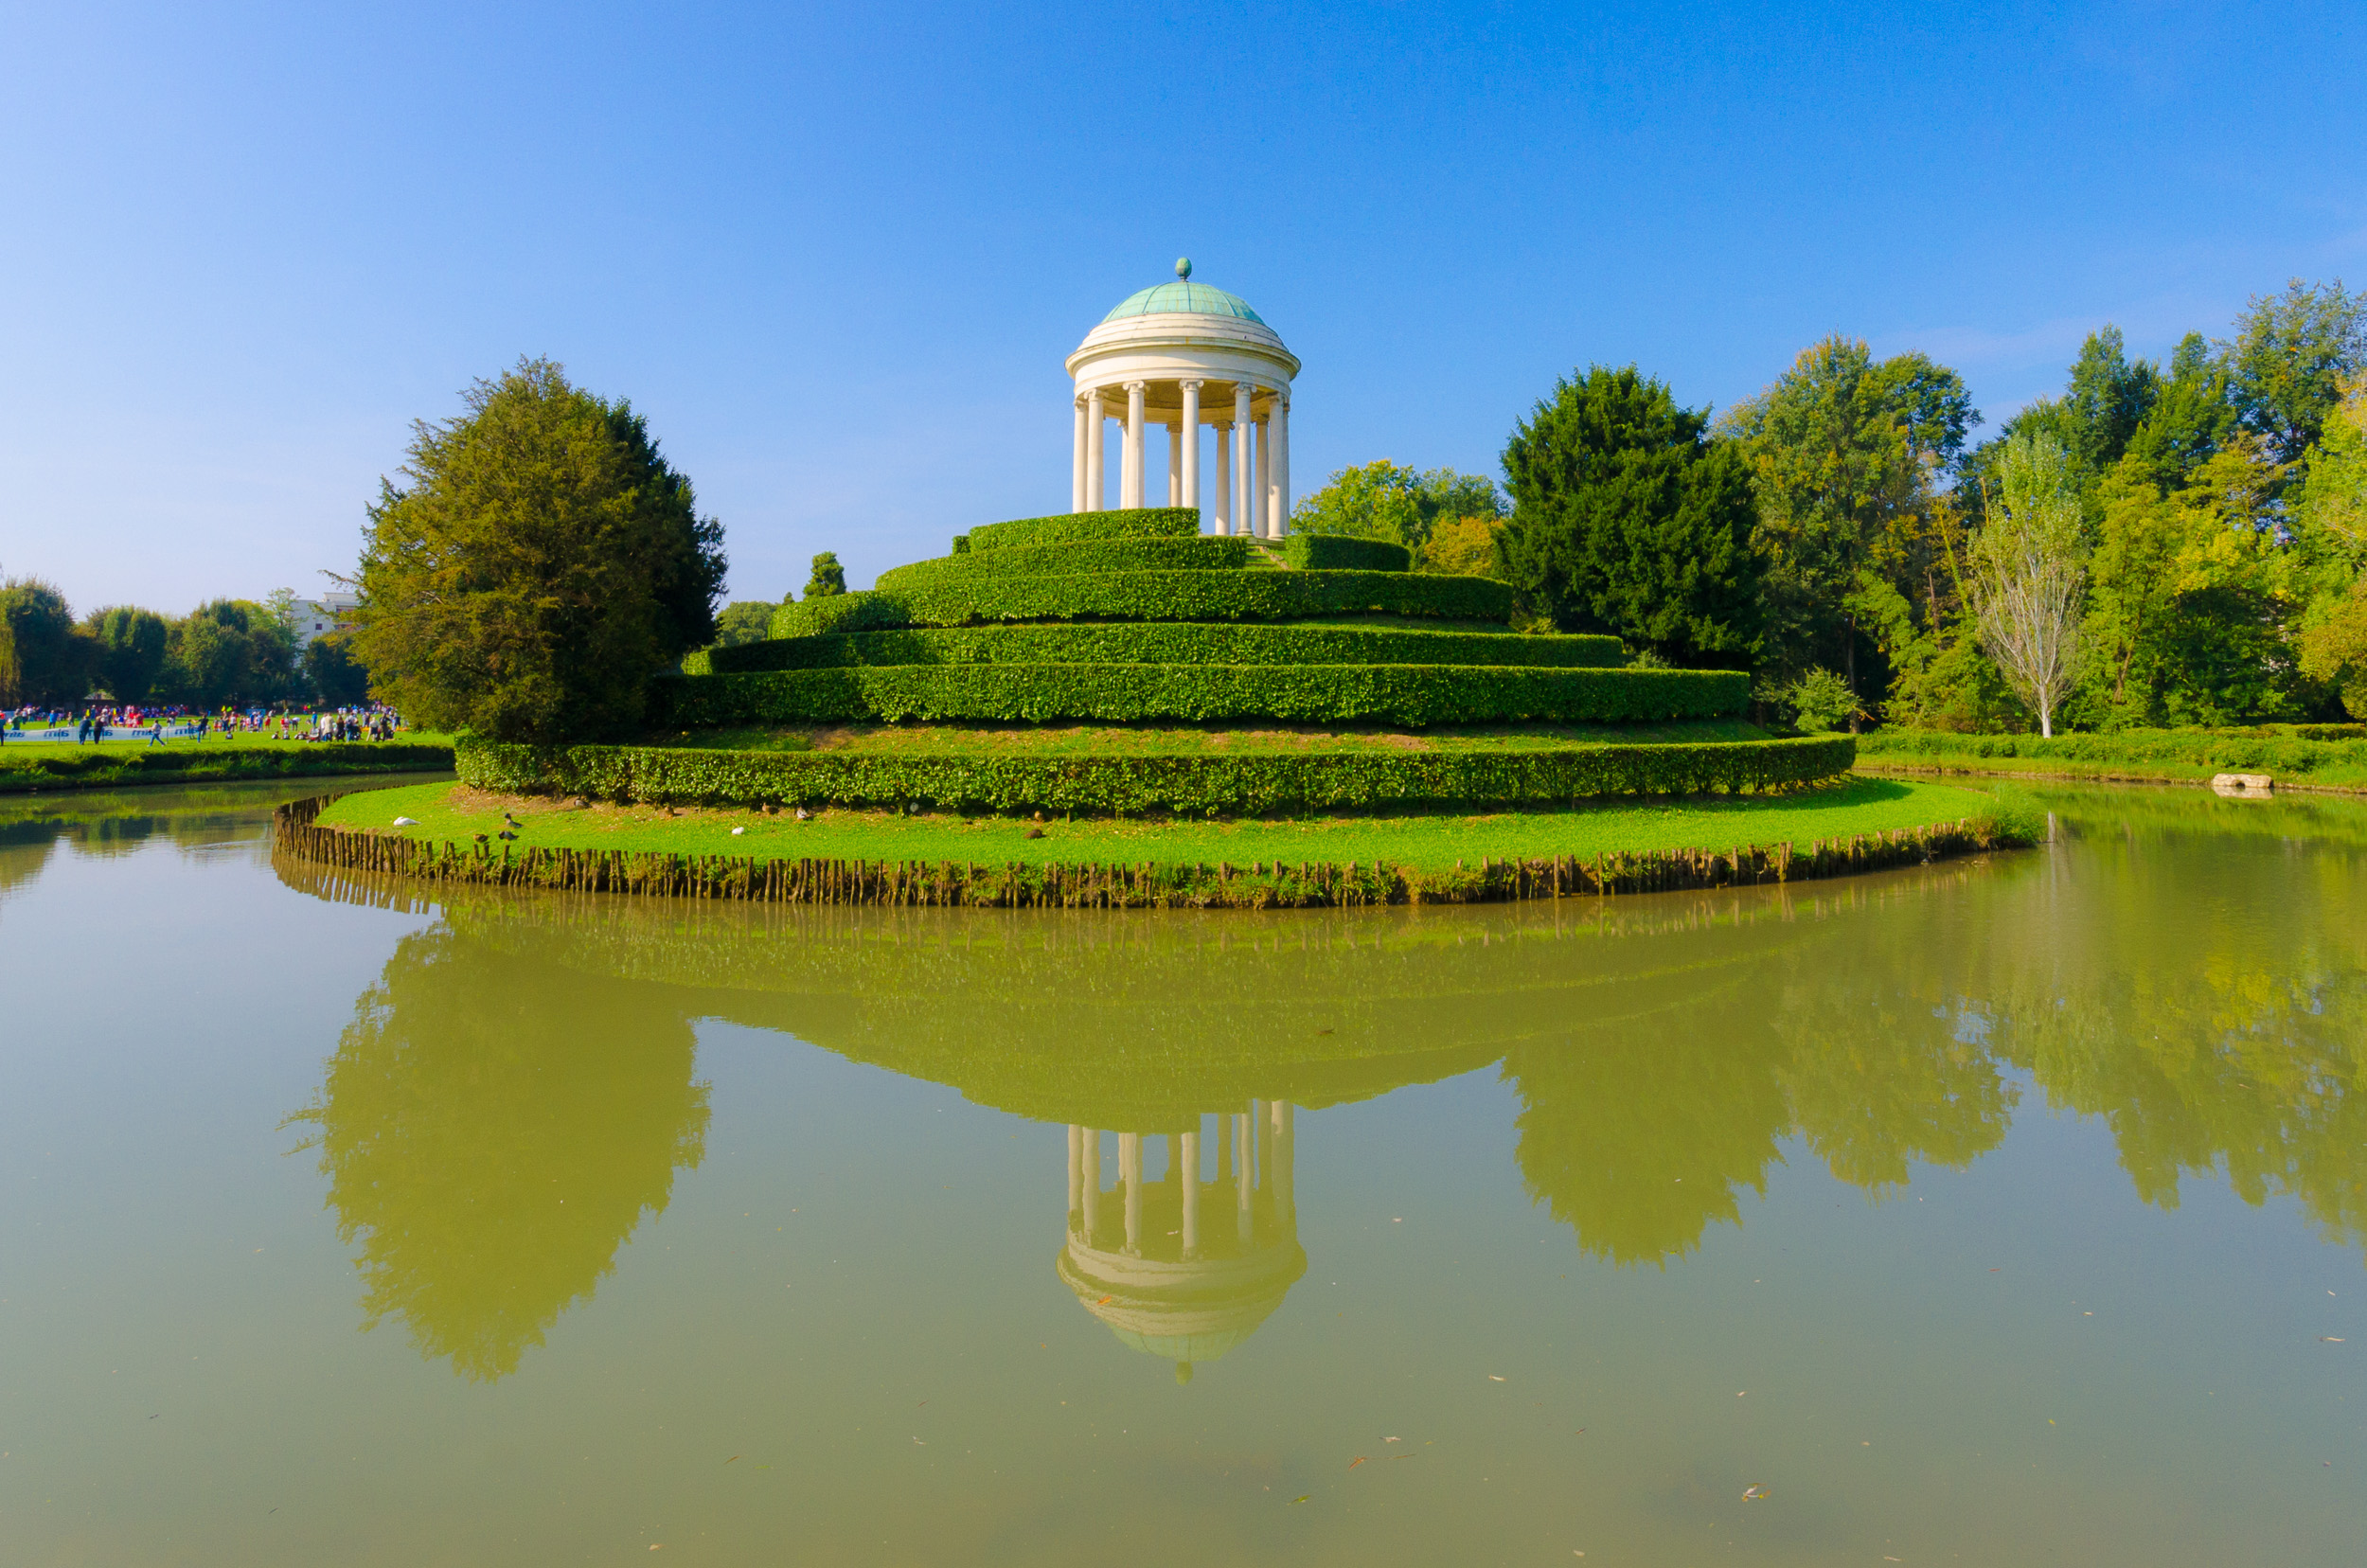 Parco Querini's temple